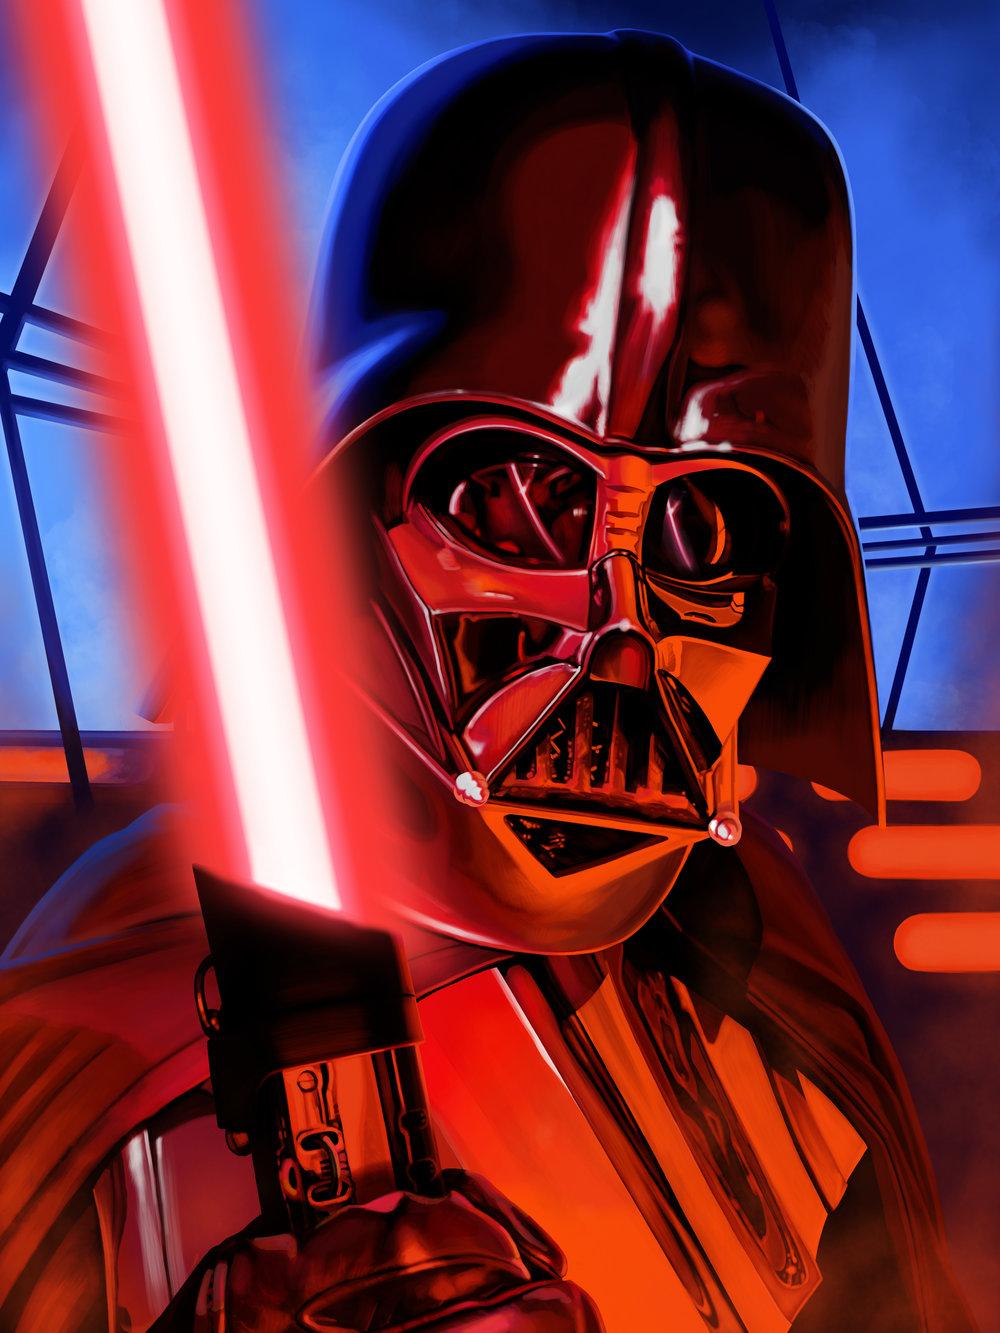 Darth Vader-Dark Lord of the Sith-portrait v2.jpg